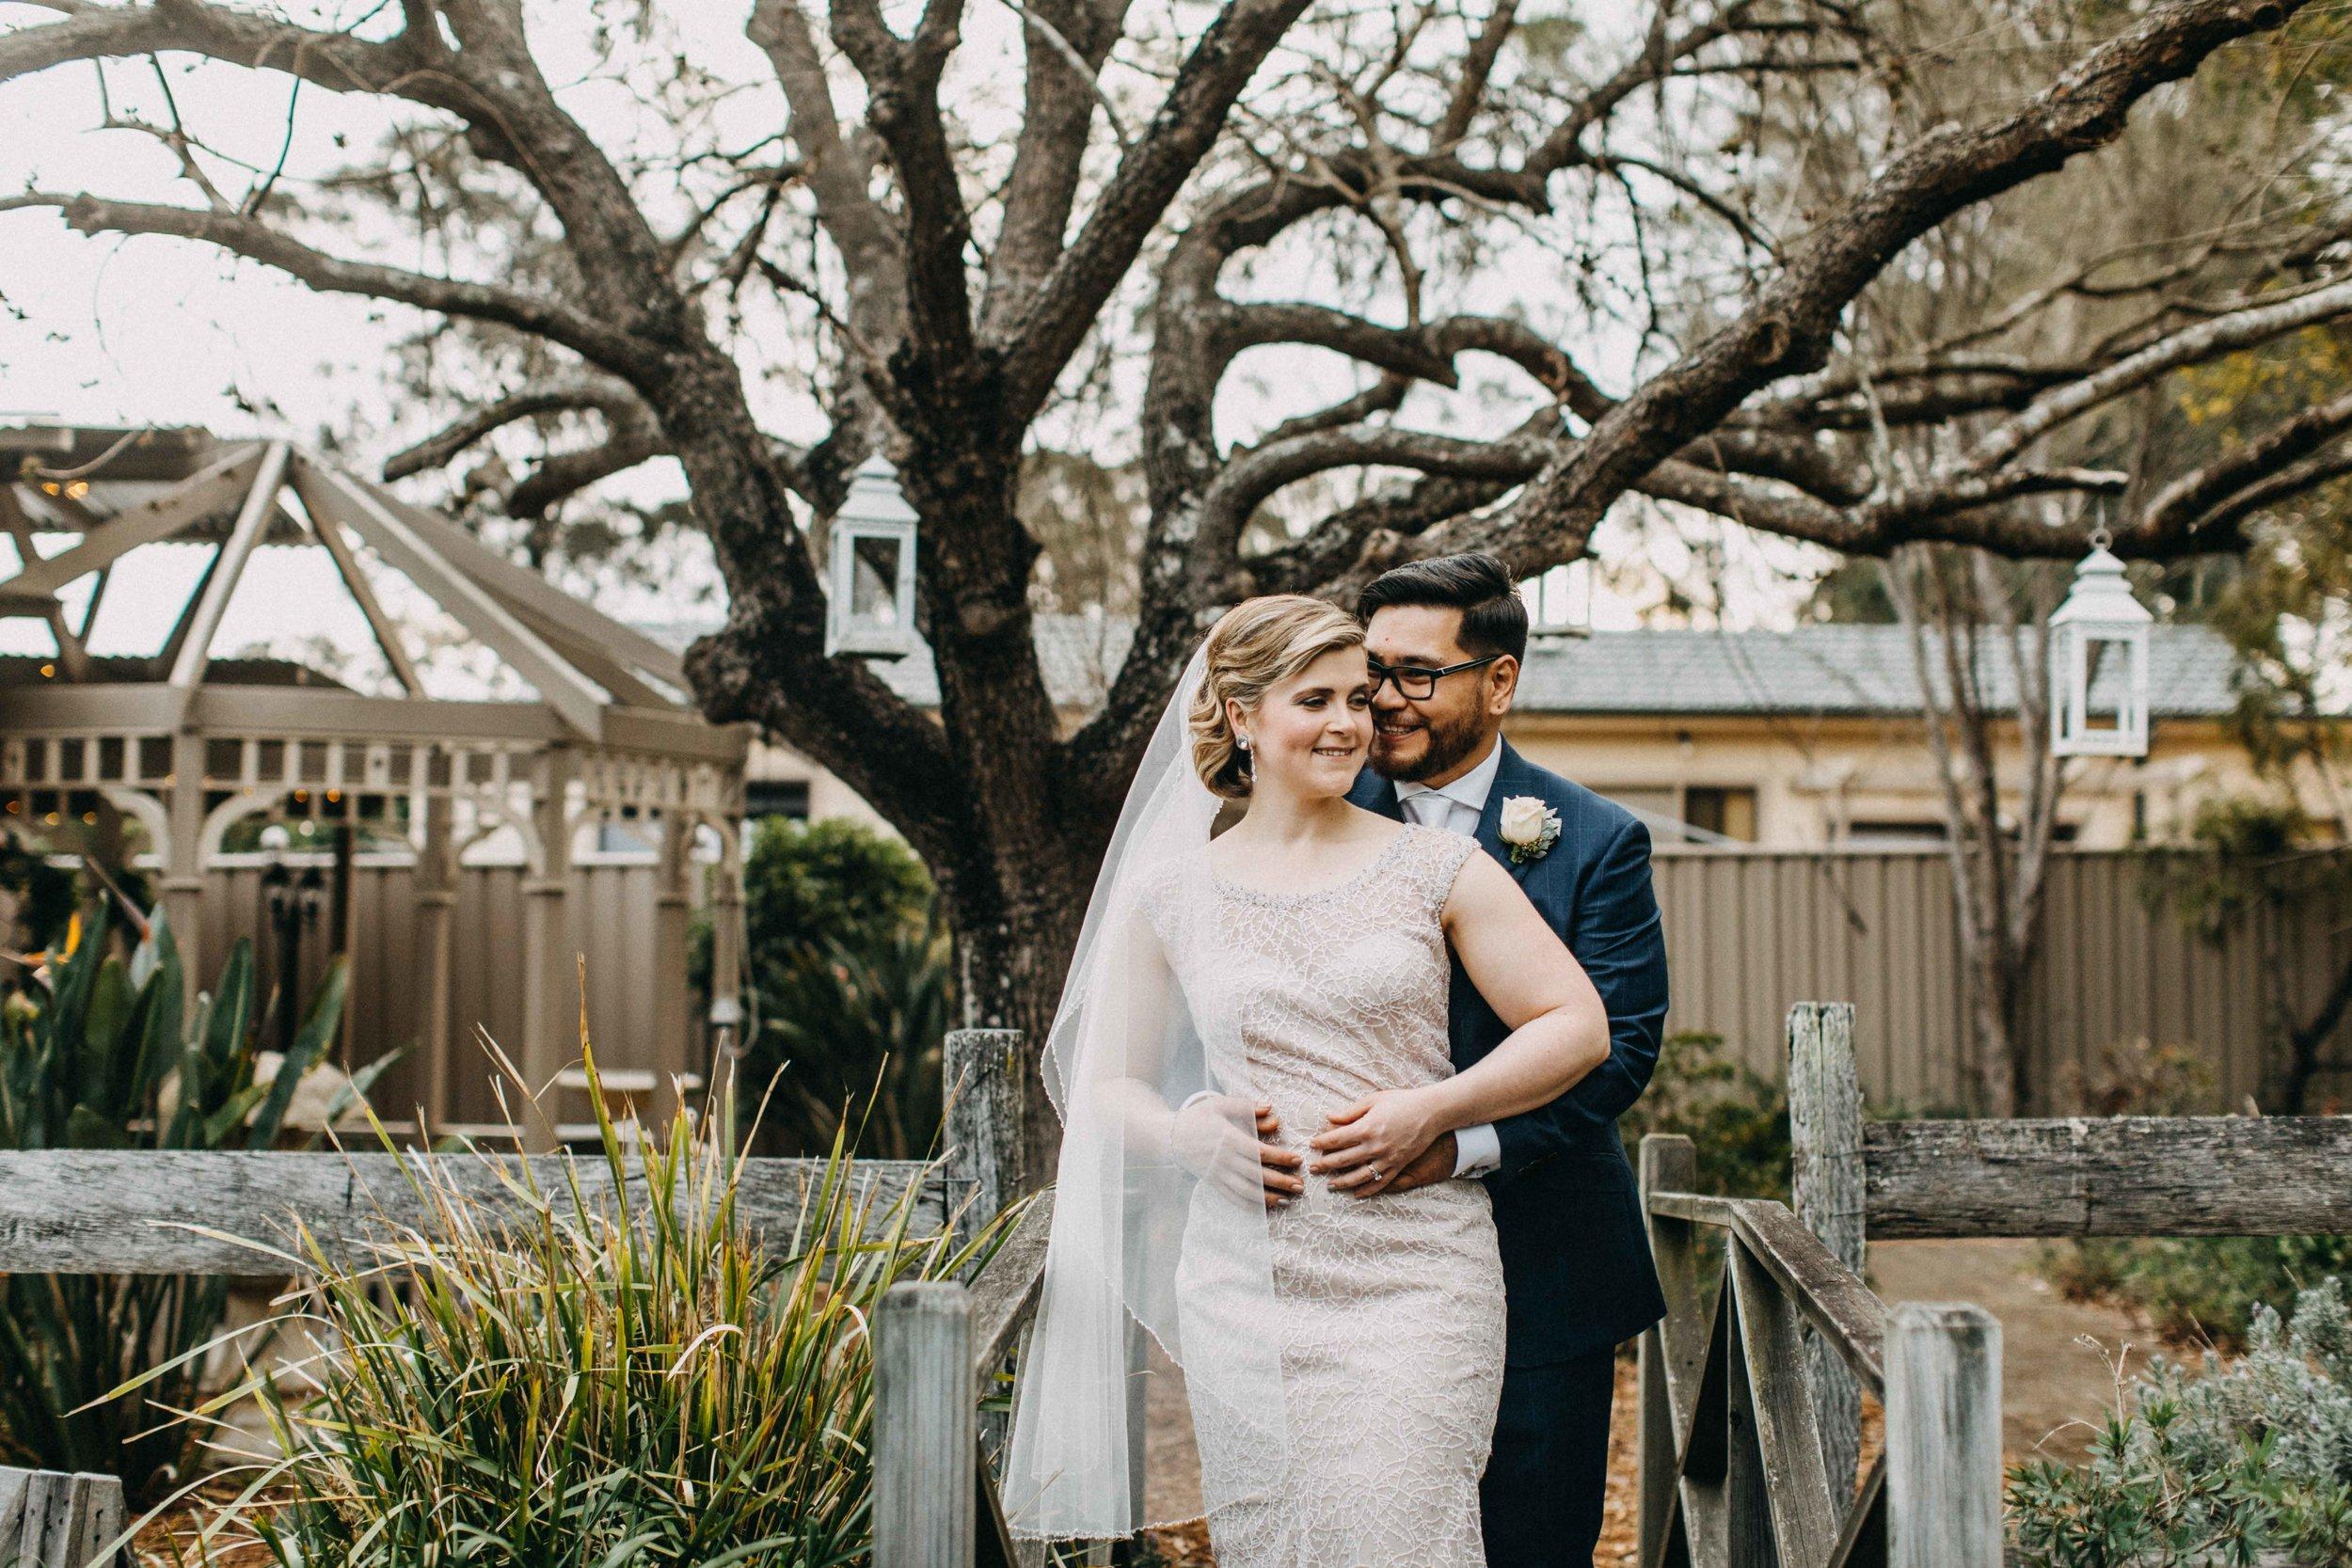 appin-house-wedding-macarthur-www.emilyobrienphotography.net-136.jpg